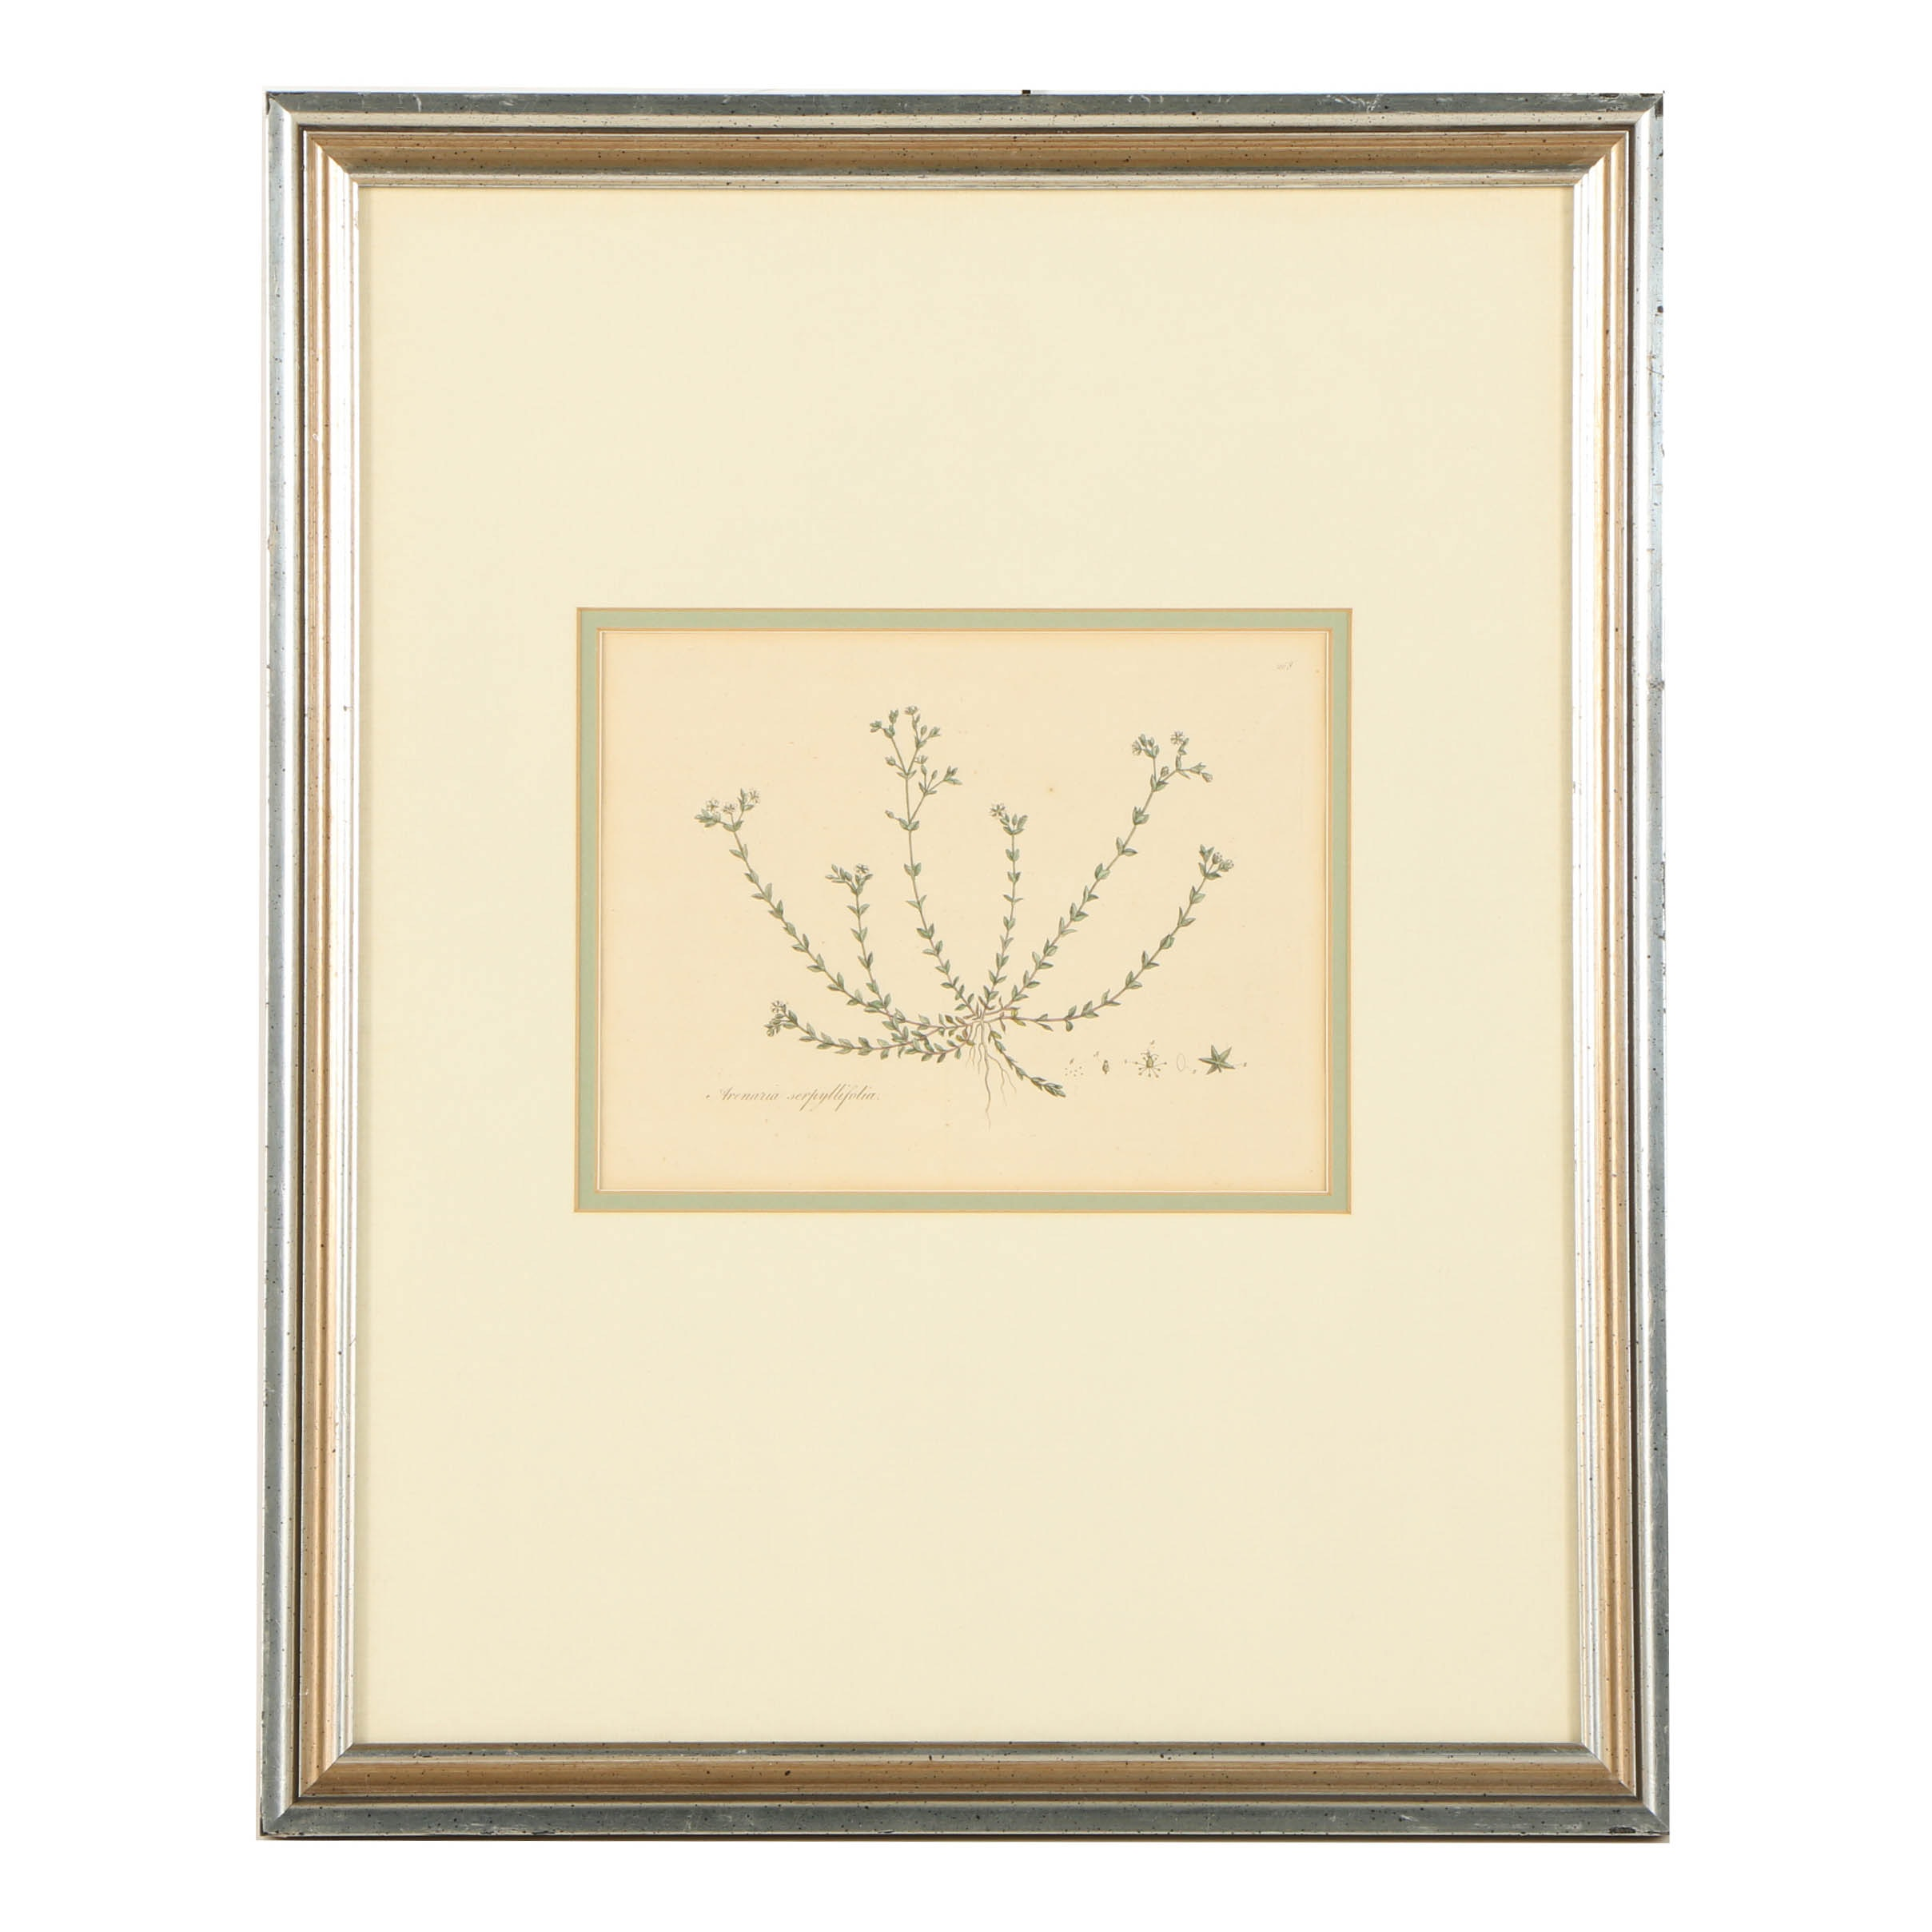 "Hand-Colored Engraving ""Arenaria Serpyllifolia"""